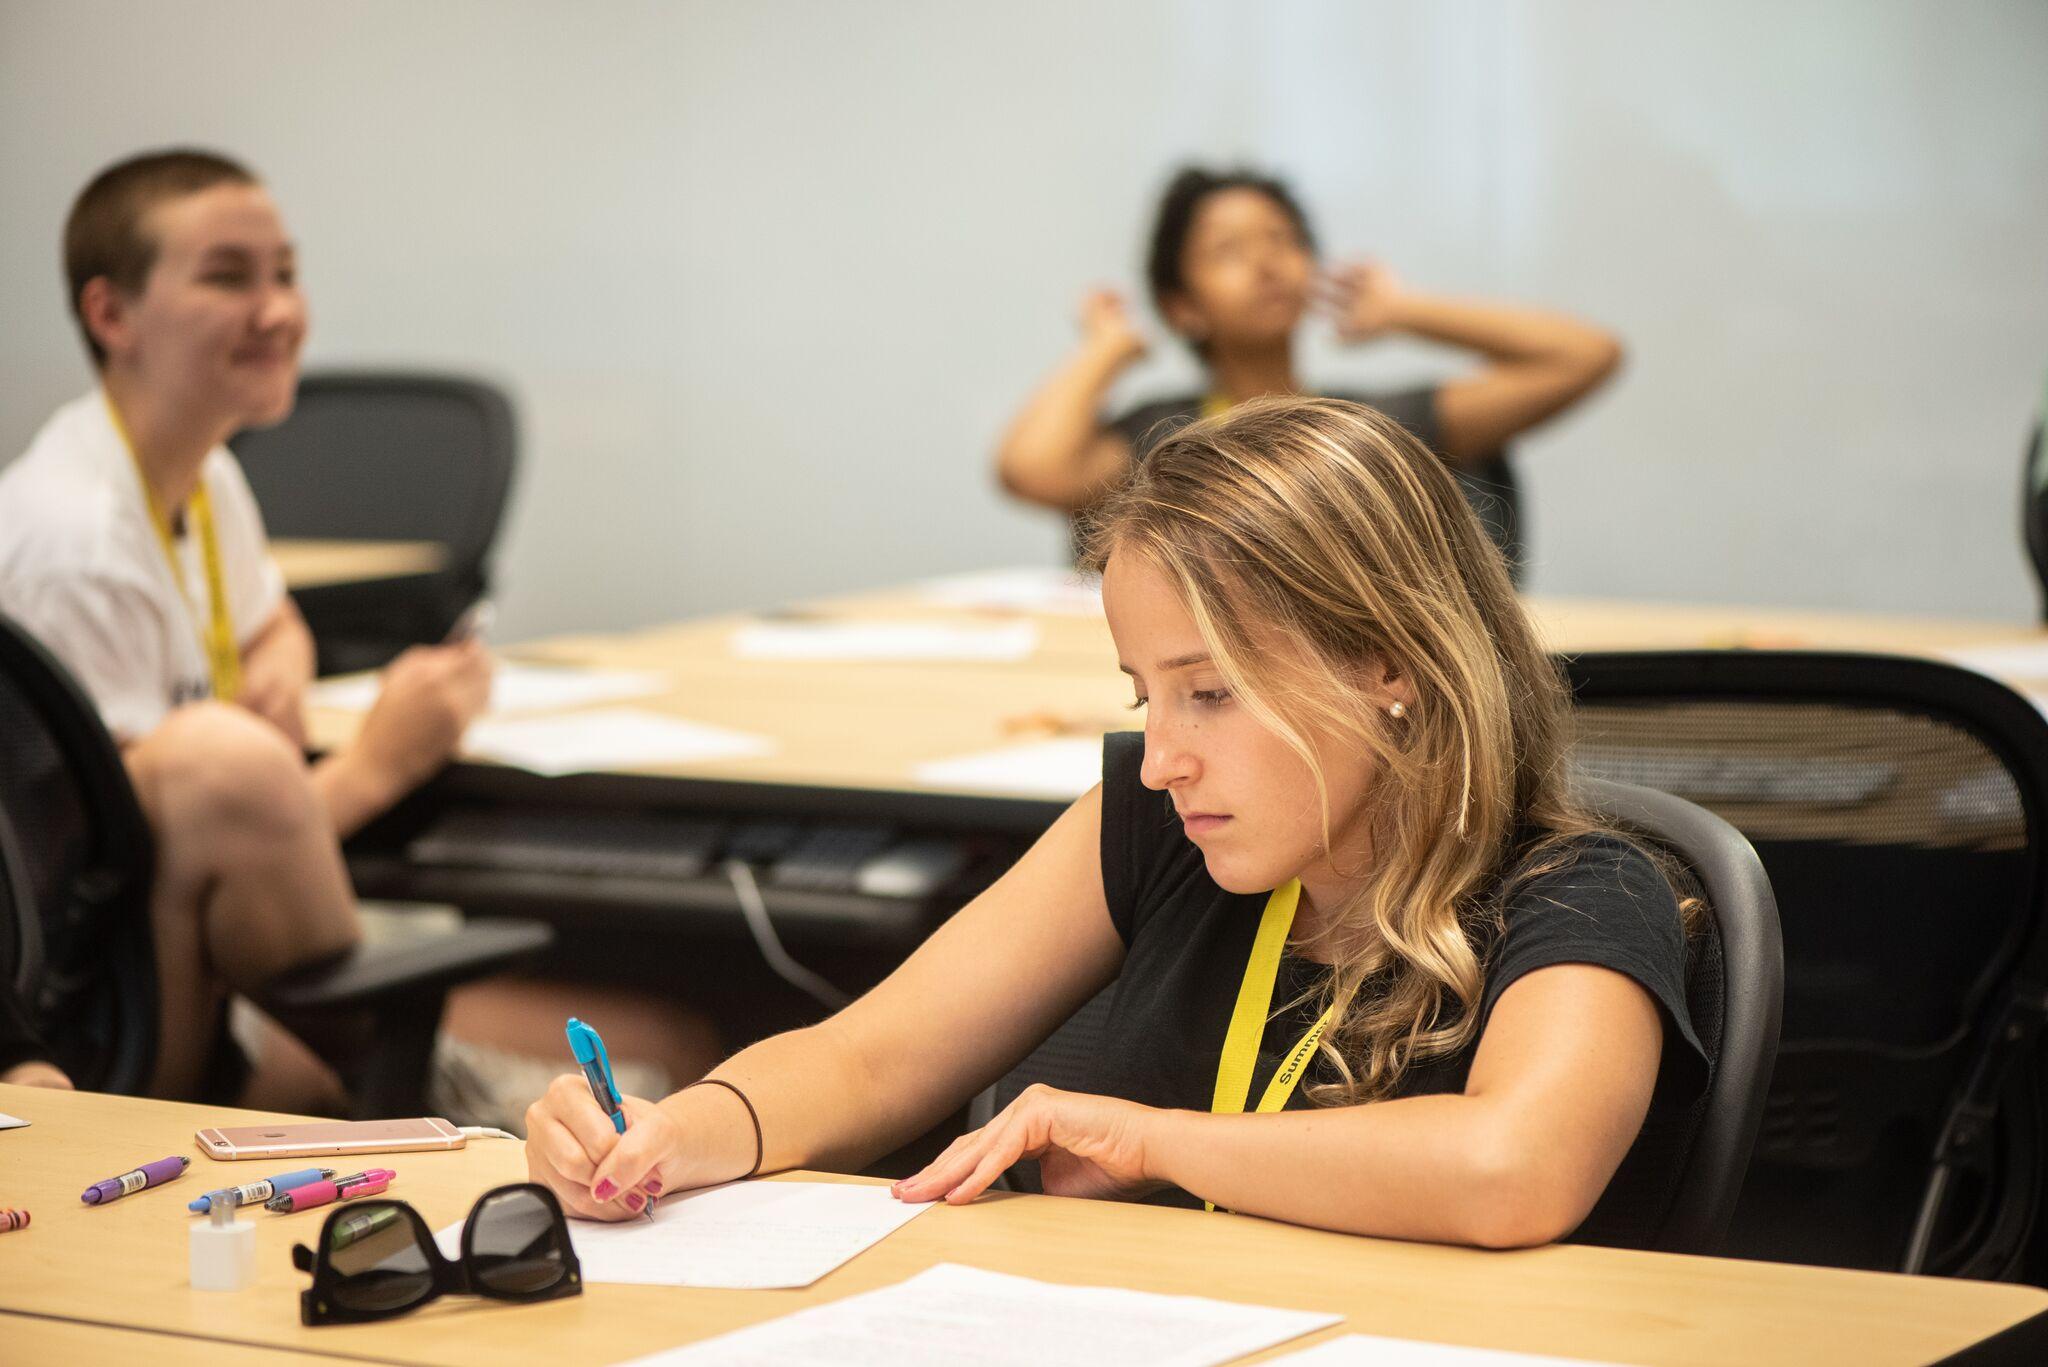 Summer Program - College Application | Smith Precollege Summer Programs